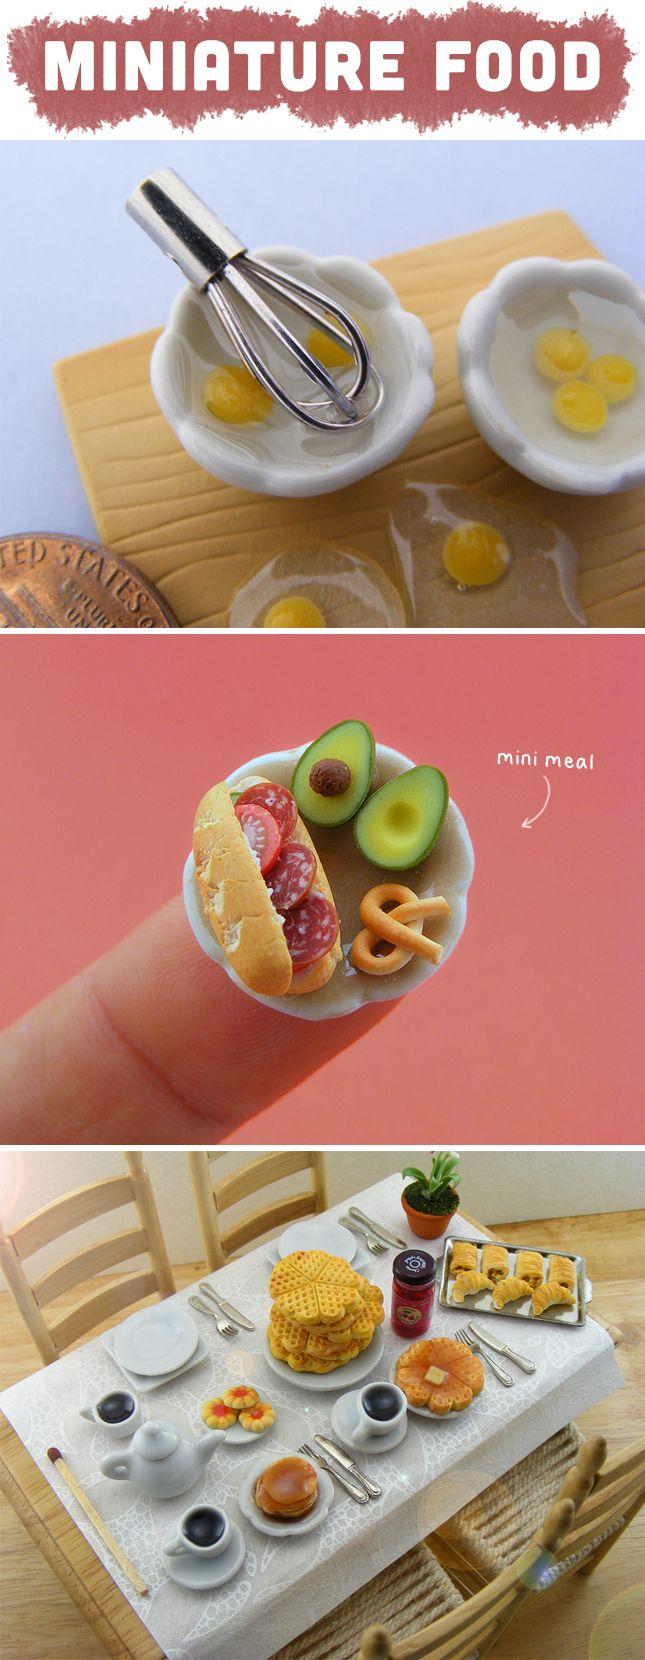 The Cutest Miniature Food | techlovedesign.com